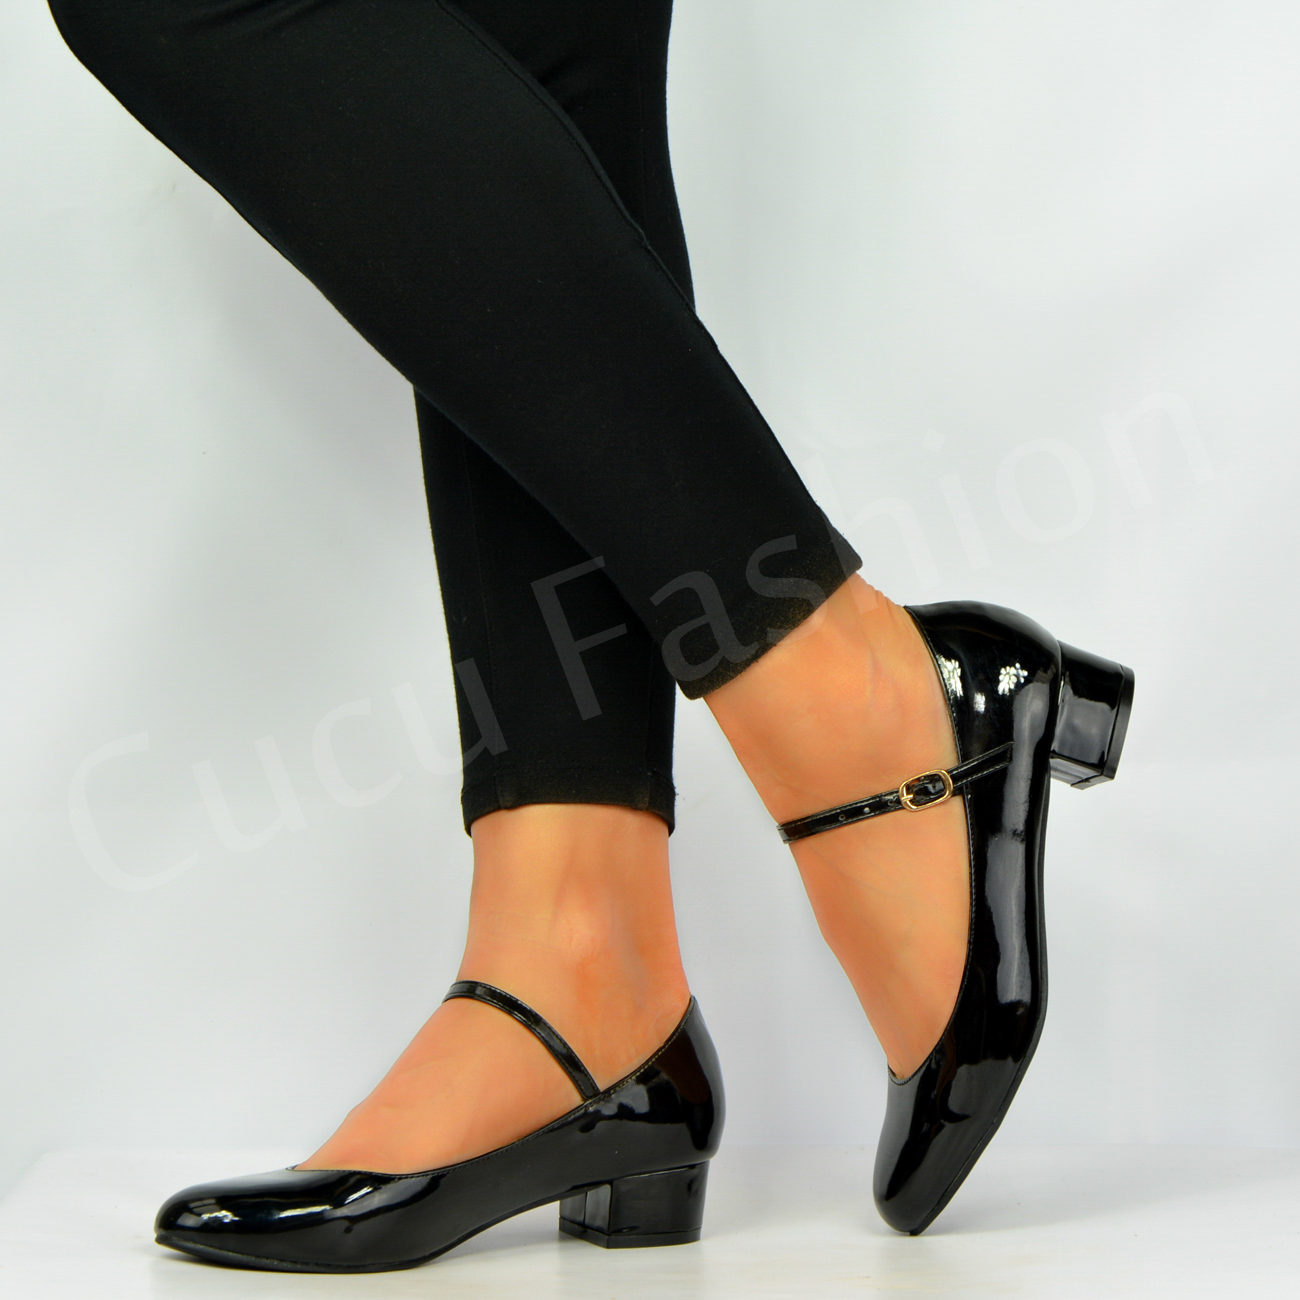 new womens low mid block heel slip on pumps patent